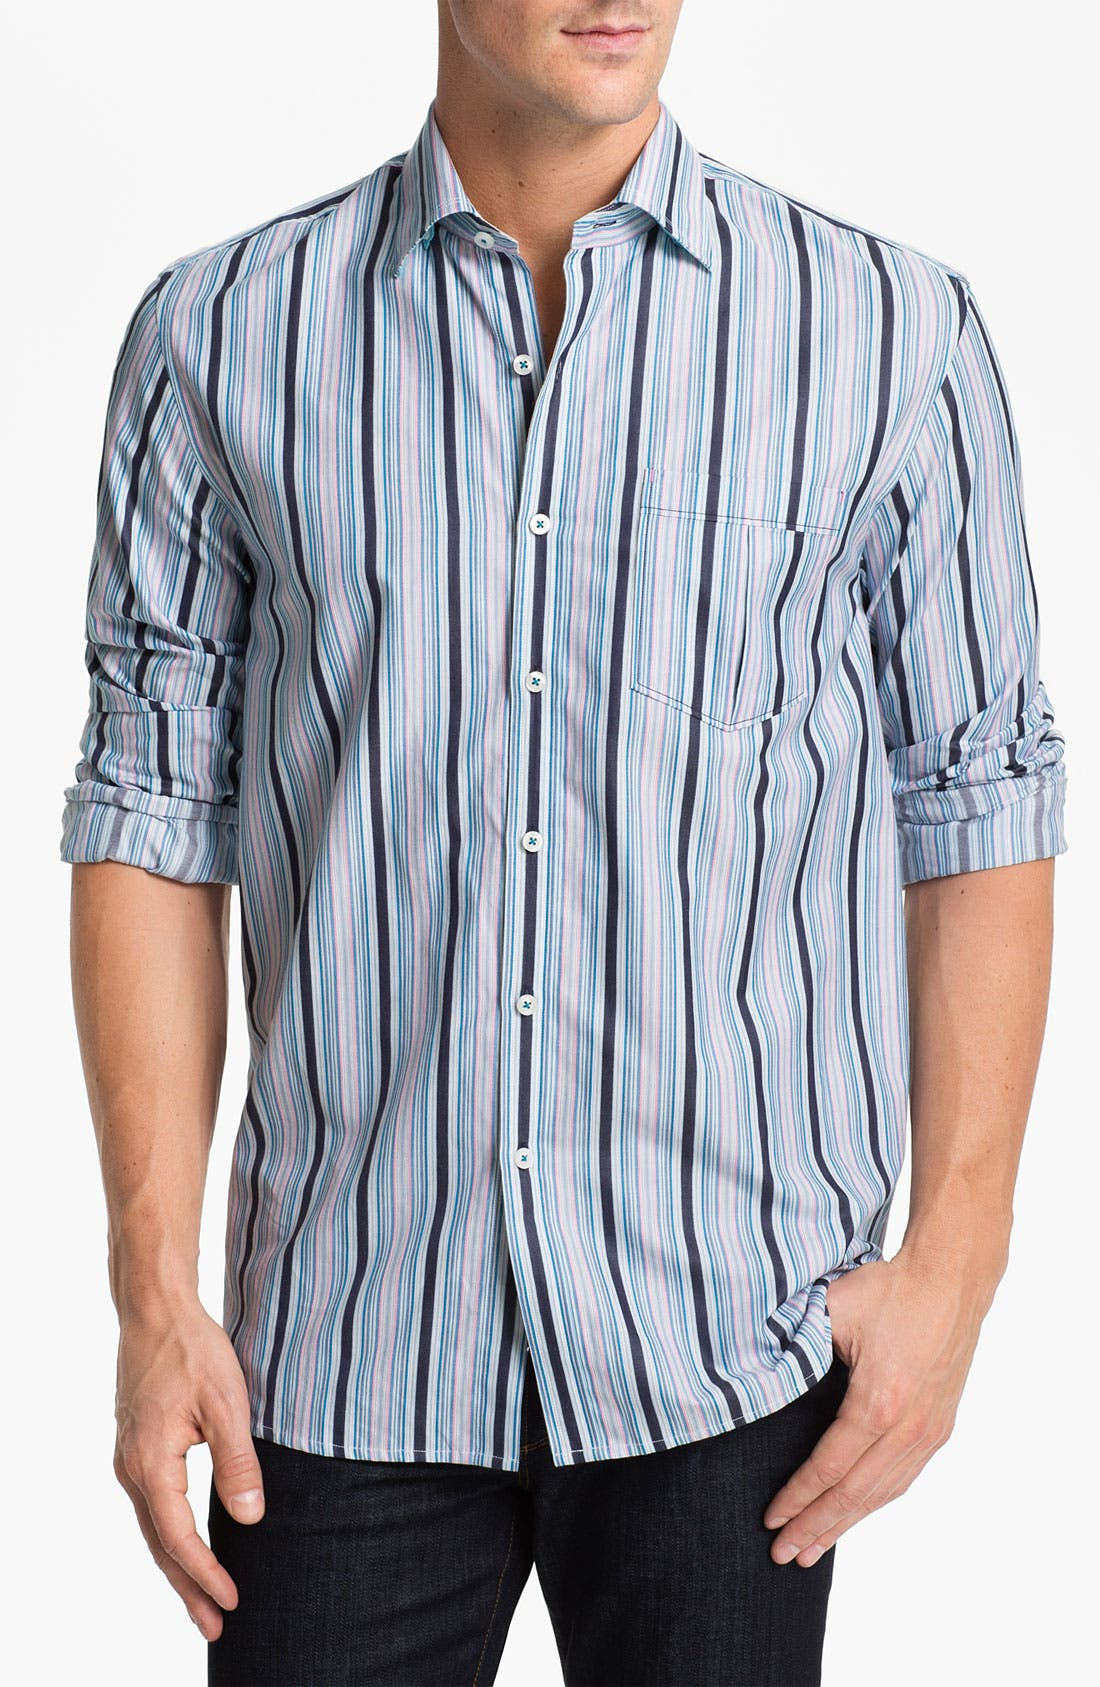 Main Image - Tommy Bahama 'Stripe del Sol' Sport Shirt